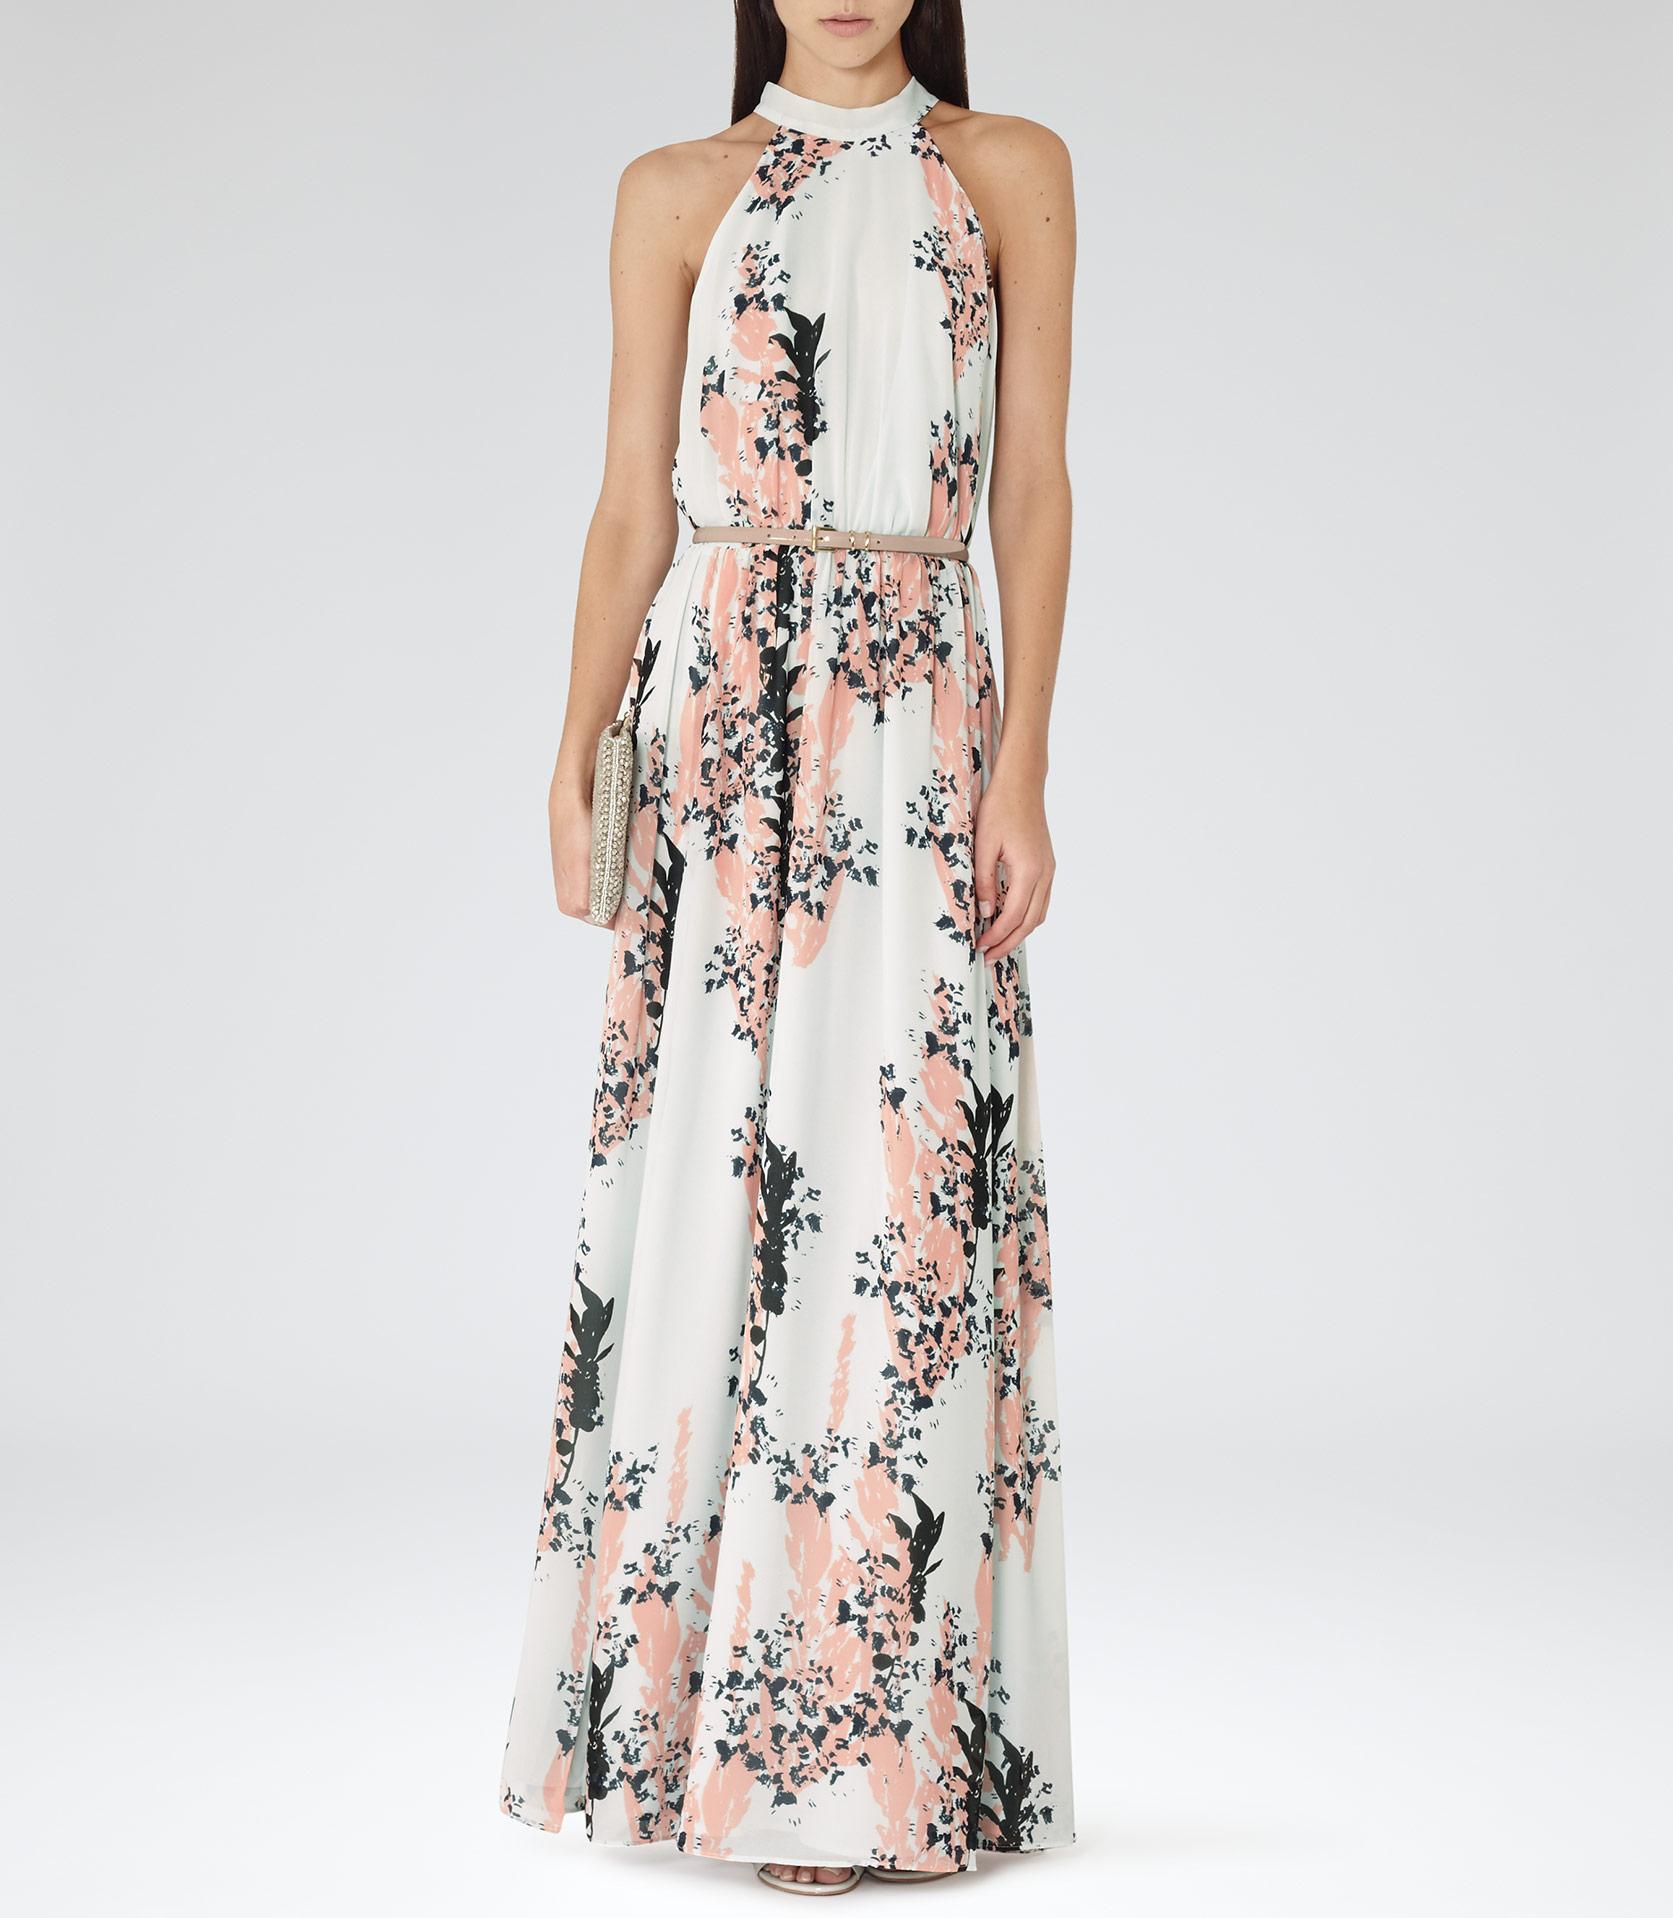 Reiss Arleta Floral-Print Maxi Dress in Pink - Lyst e4fcaf975